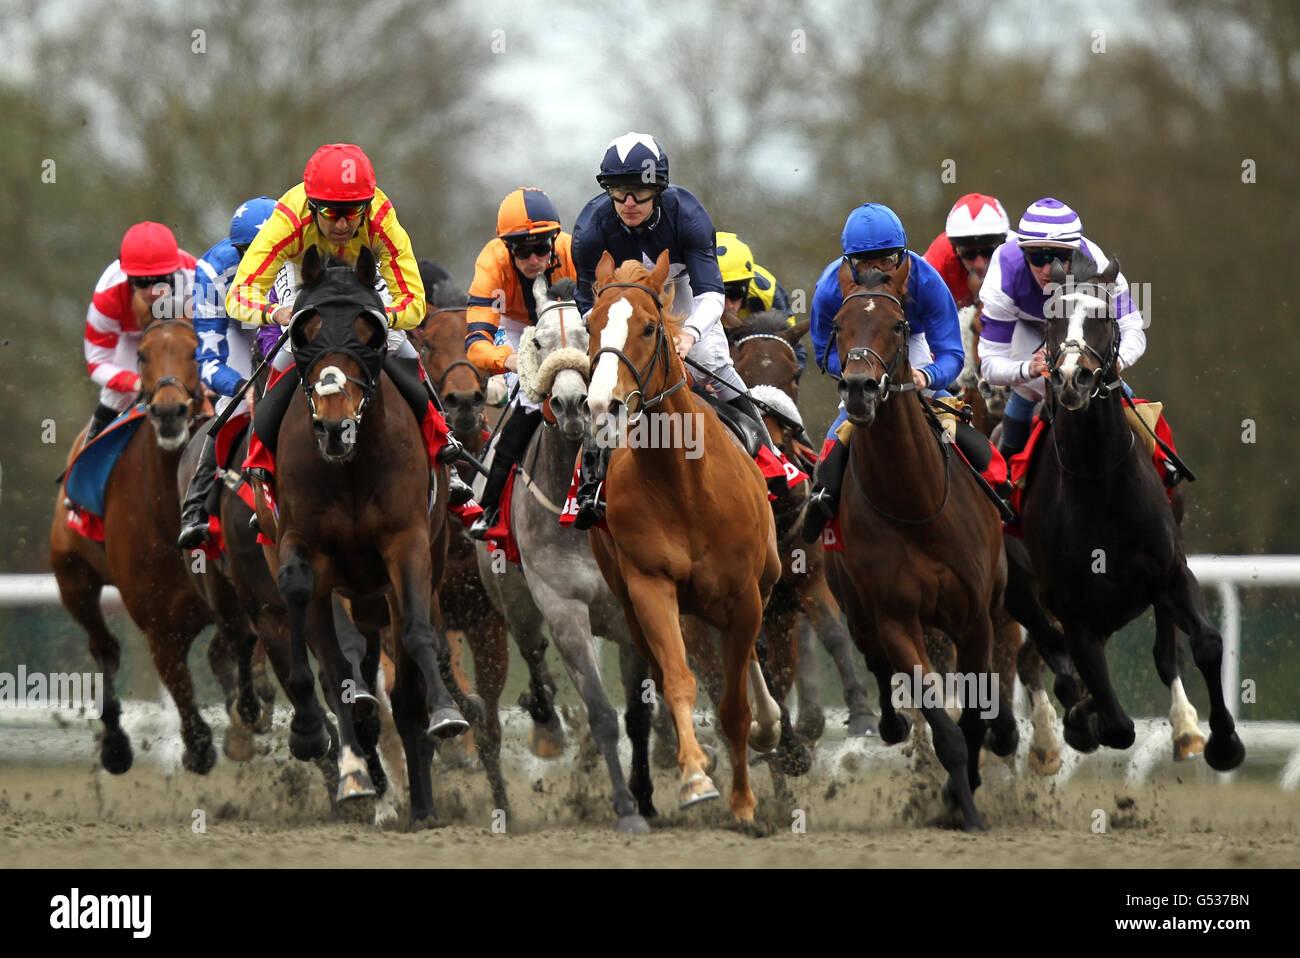 Nazeef stock photos nazeef stock images alamy horse racing easter family fun day kempton park racecourse stock image negle Images